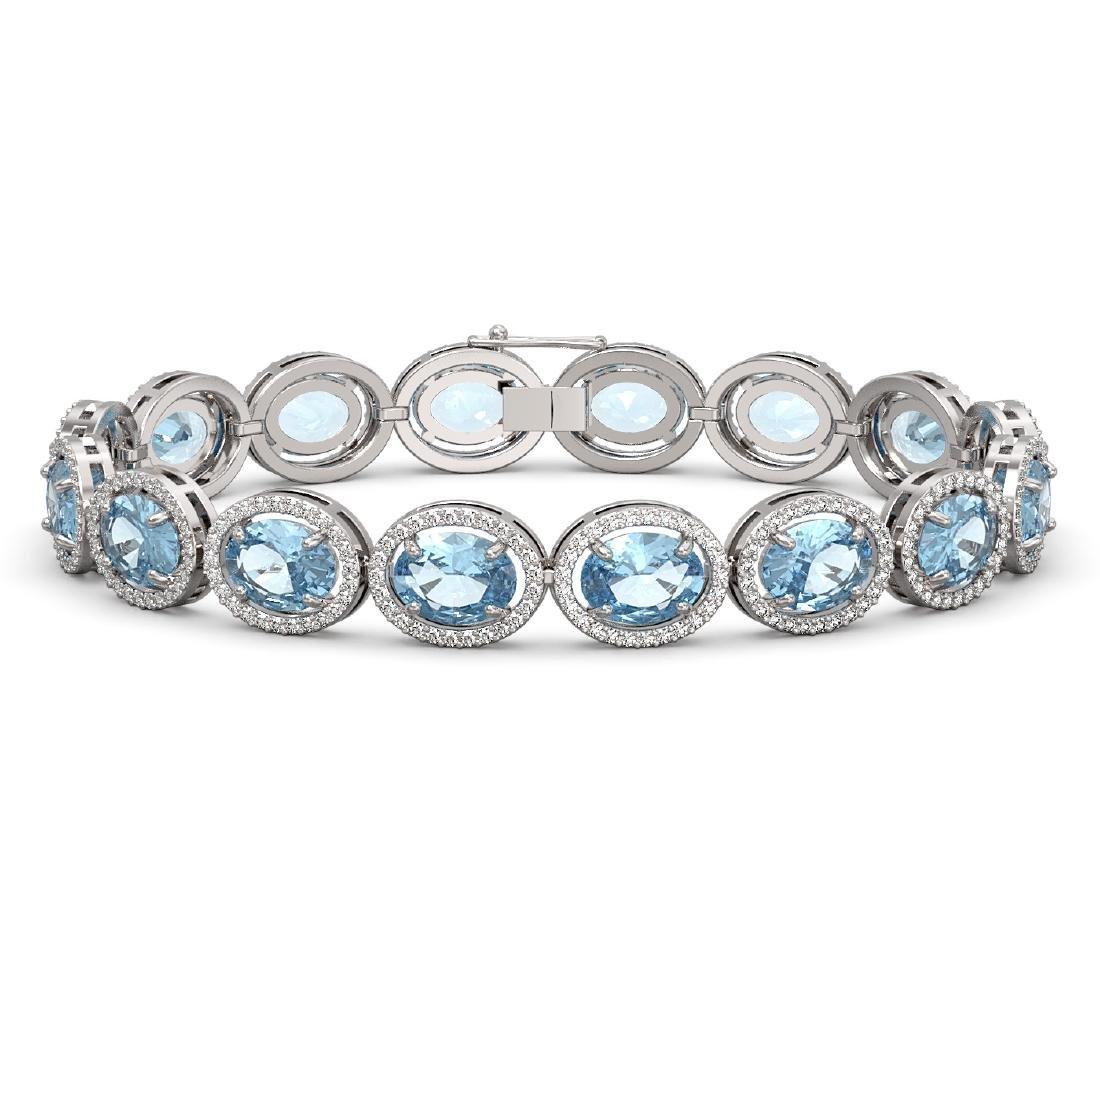 23.44 CTW Aquamarine & Diamond Halo Bracelet 10K White